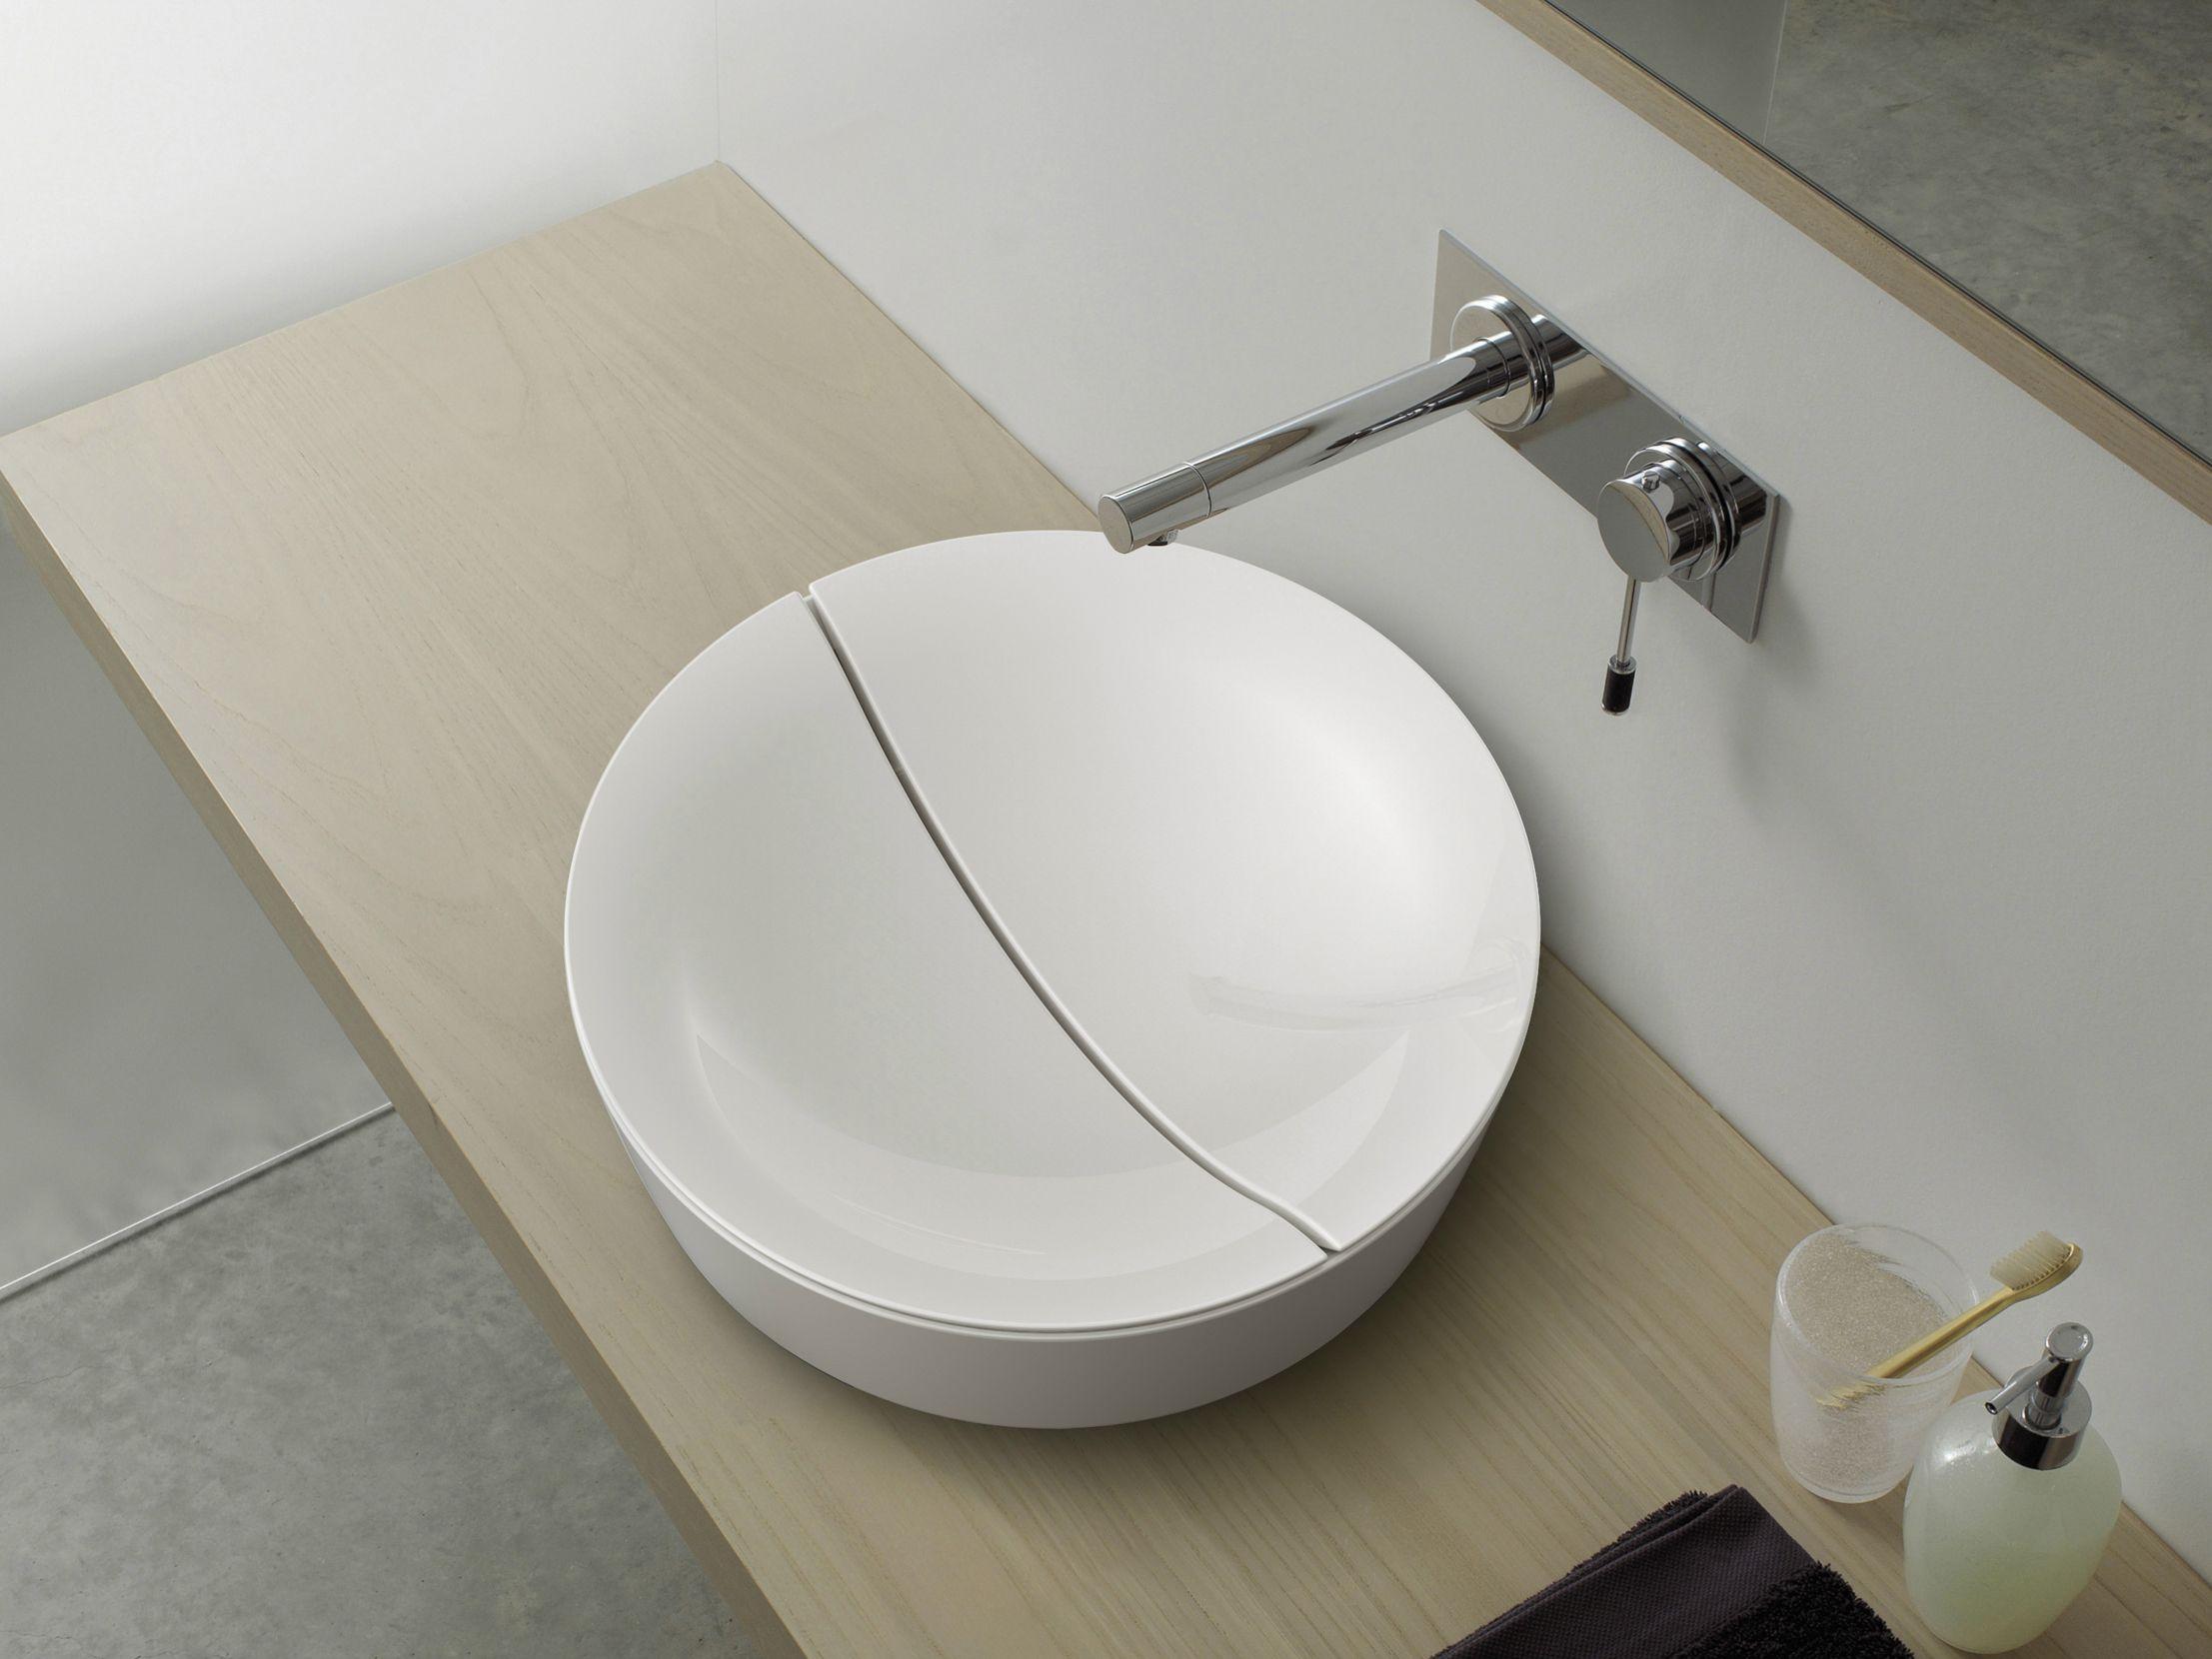 mizu round washbasin by scarabeo ceramiche design emo design. Black Bedroom Furniture Sets. Home Design Ideas